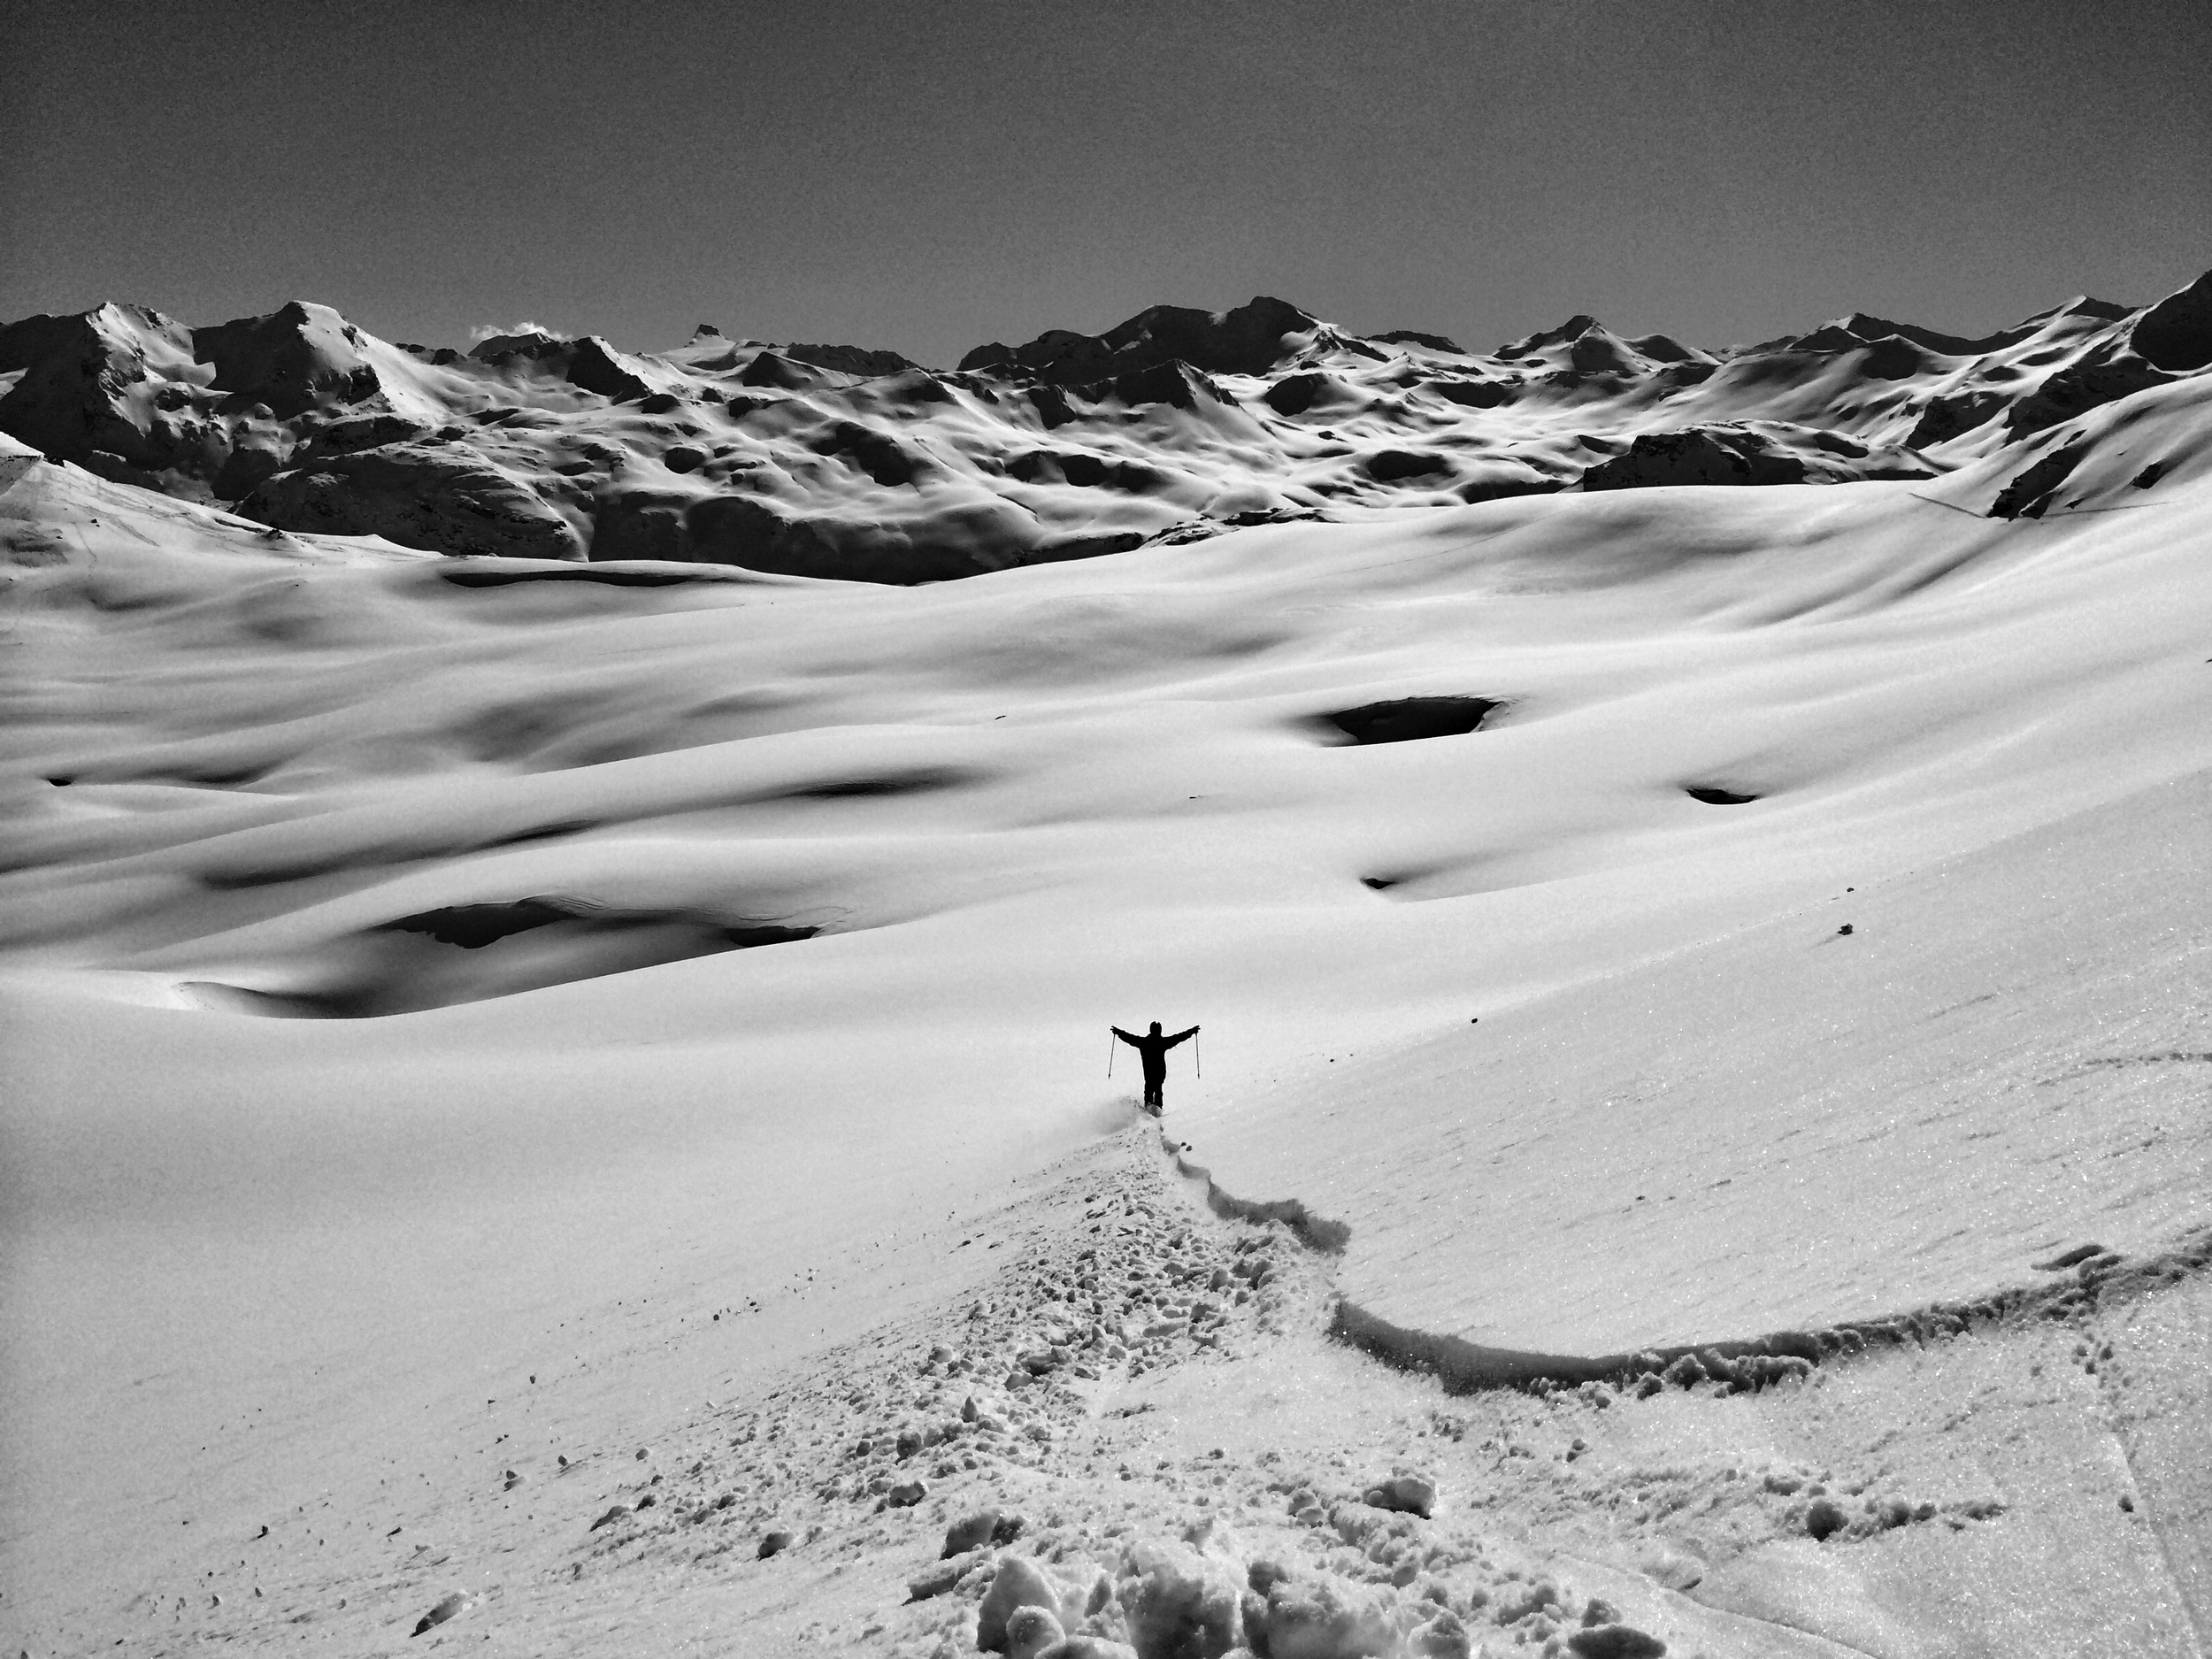 Jesper Tjader enjoying the vast mountains of Val D'Isere